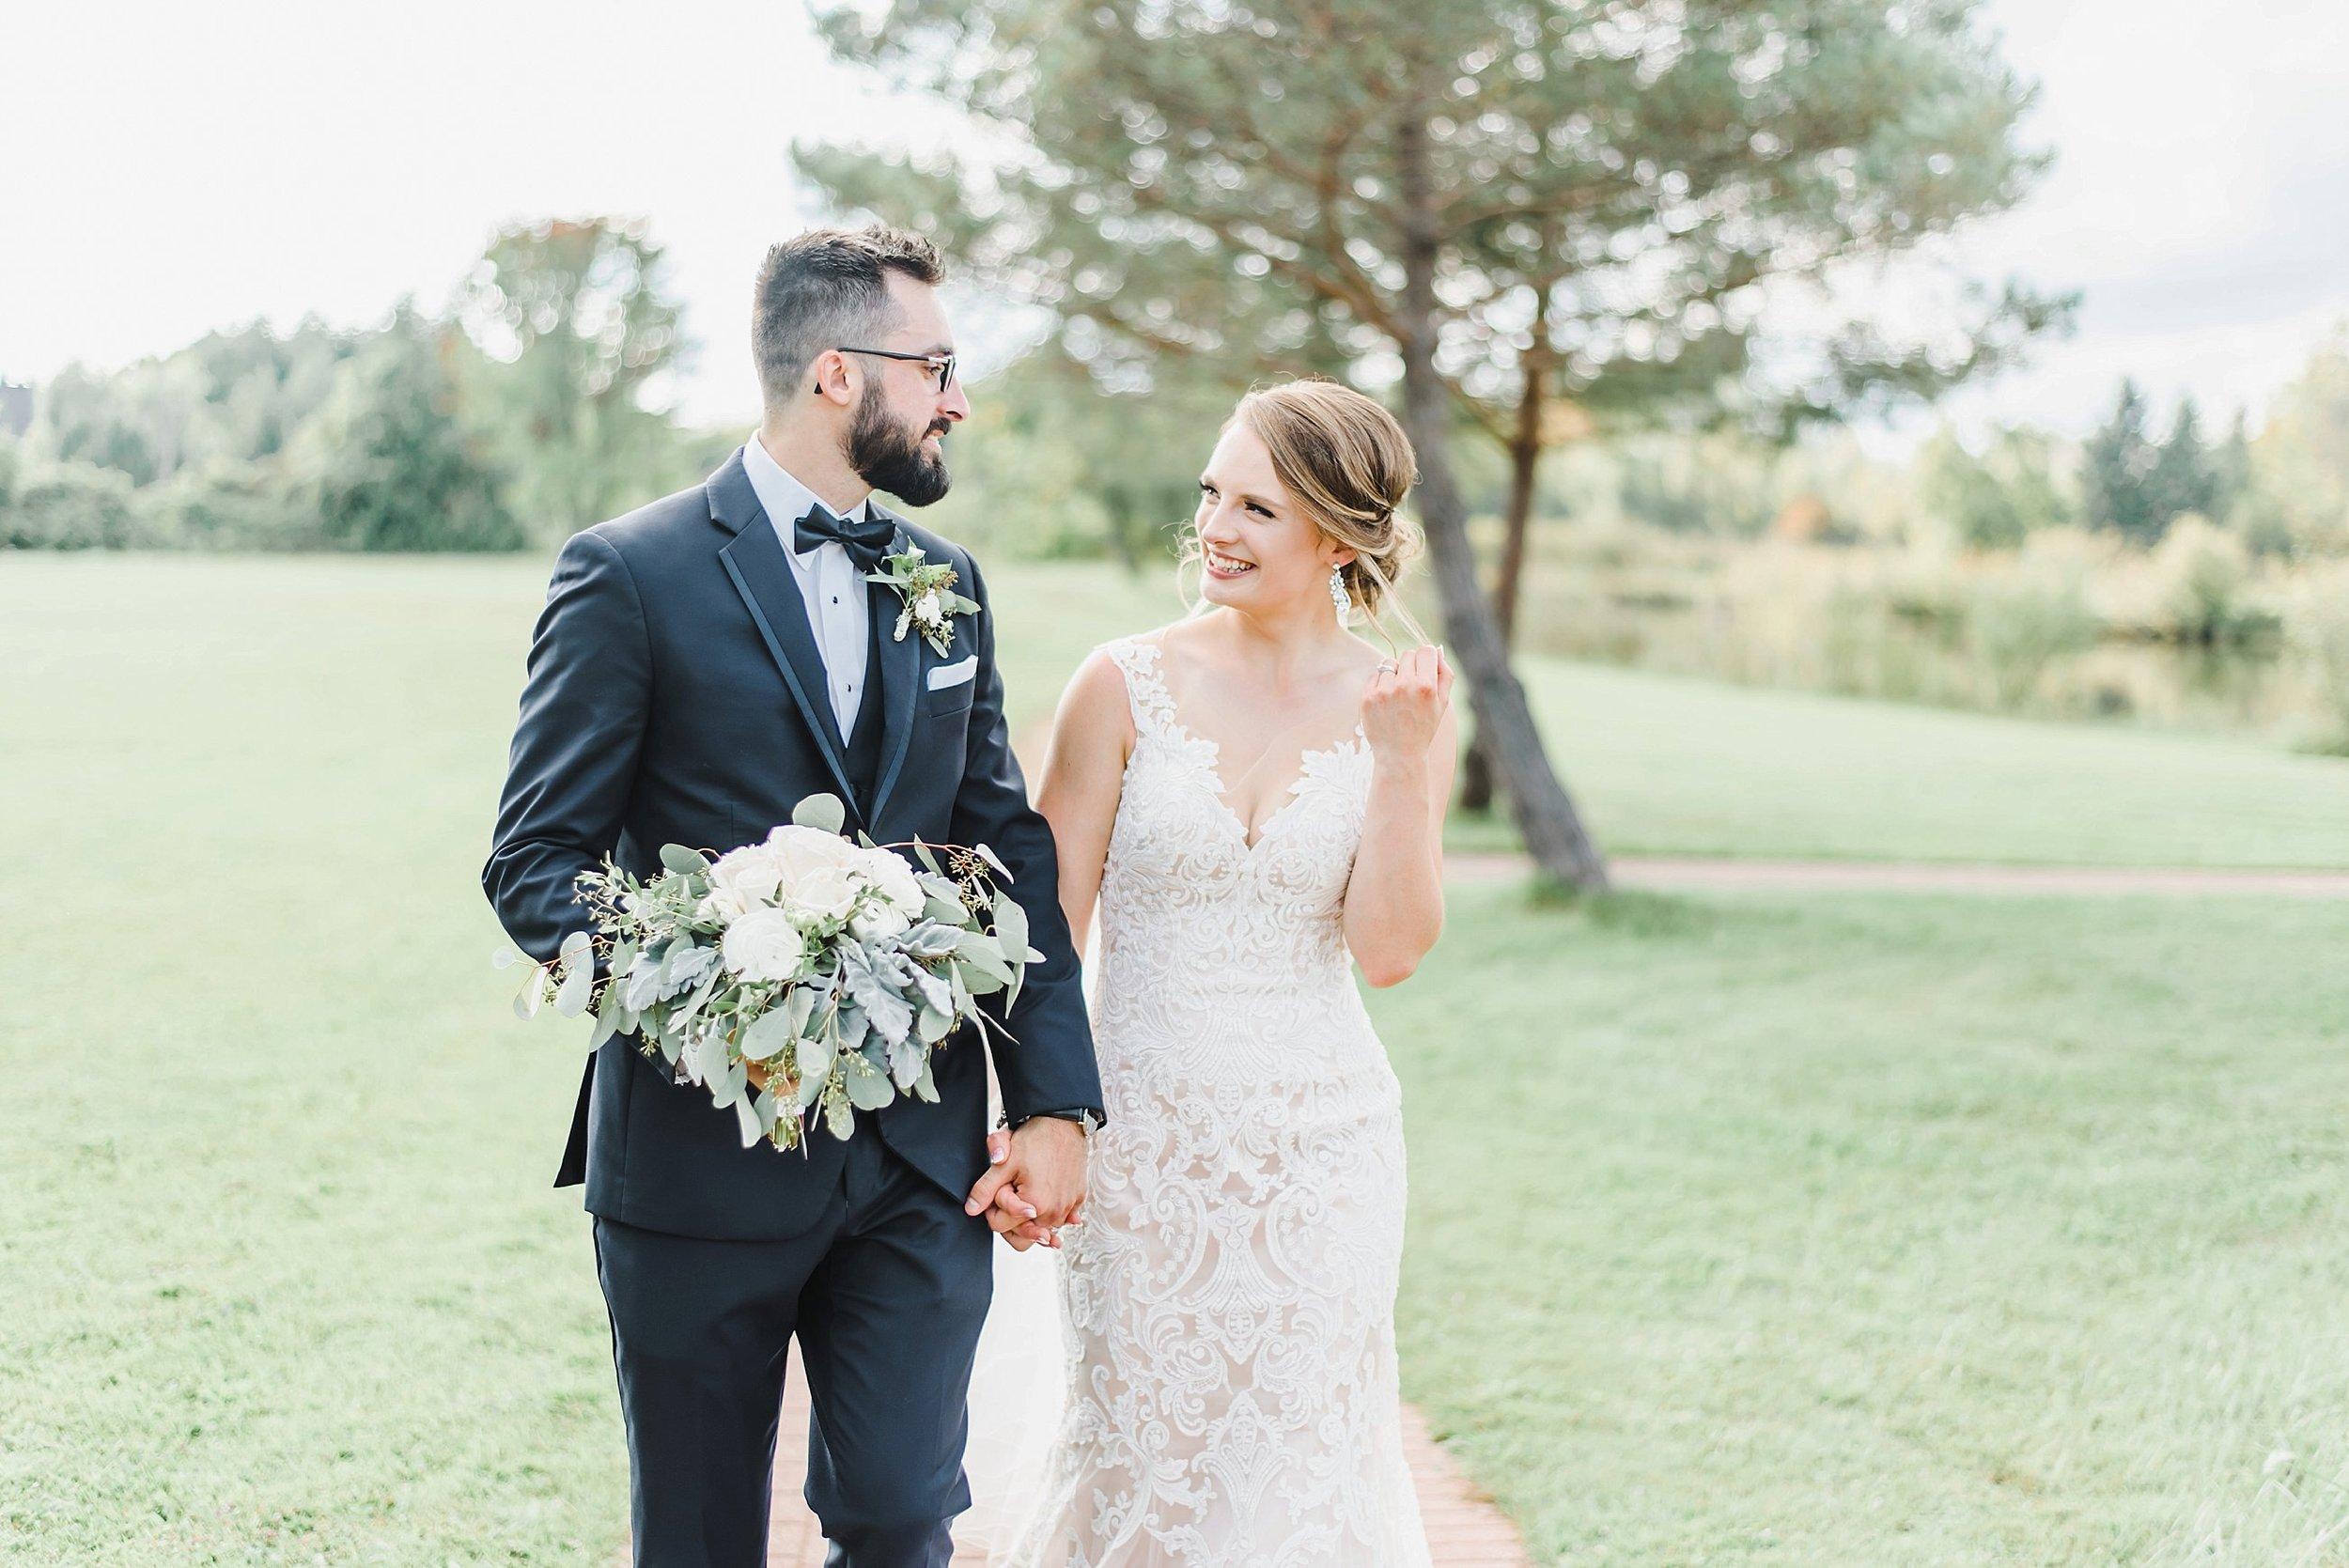 light airy indie fine art ottawa wedding photographer | Ali and Batoul Photography_1319.jpg